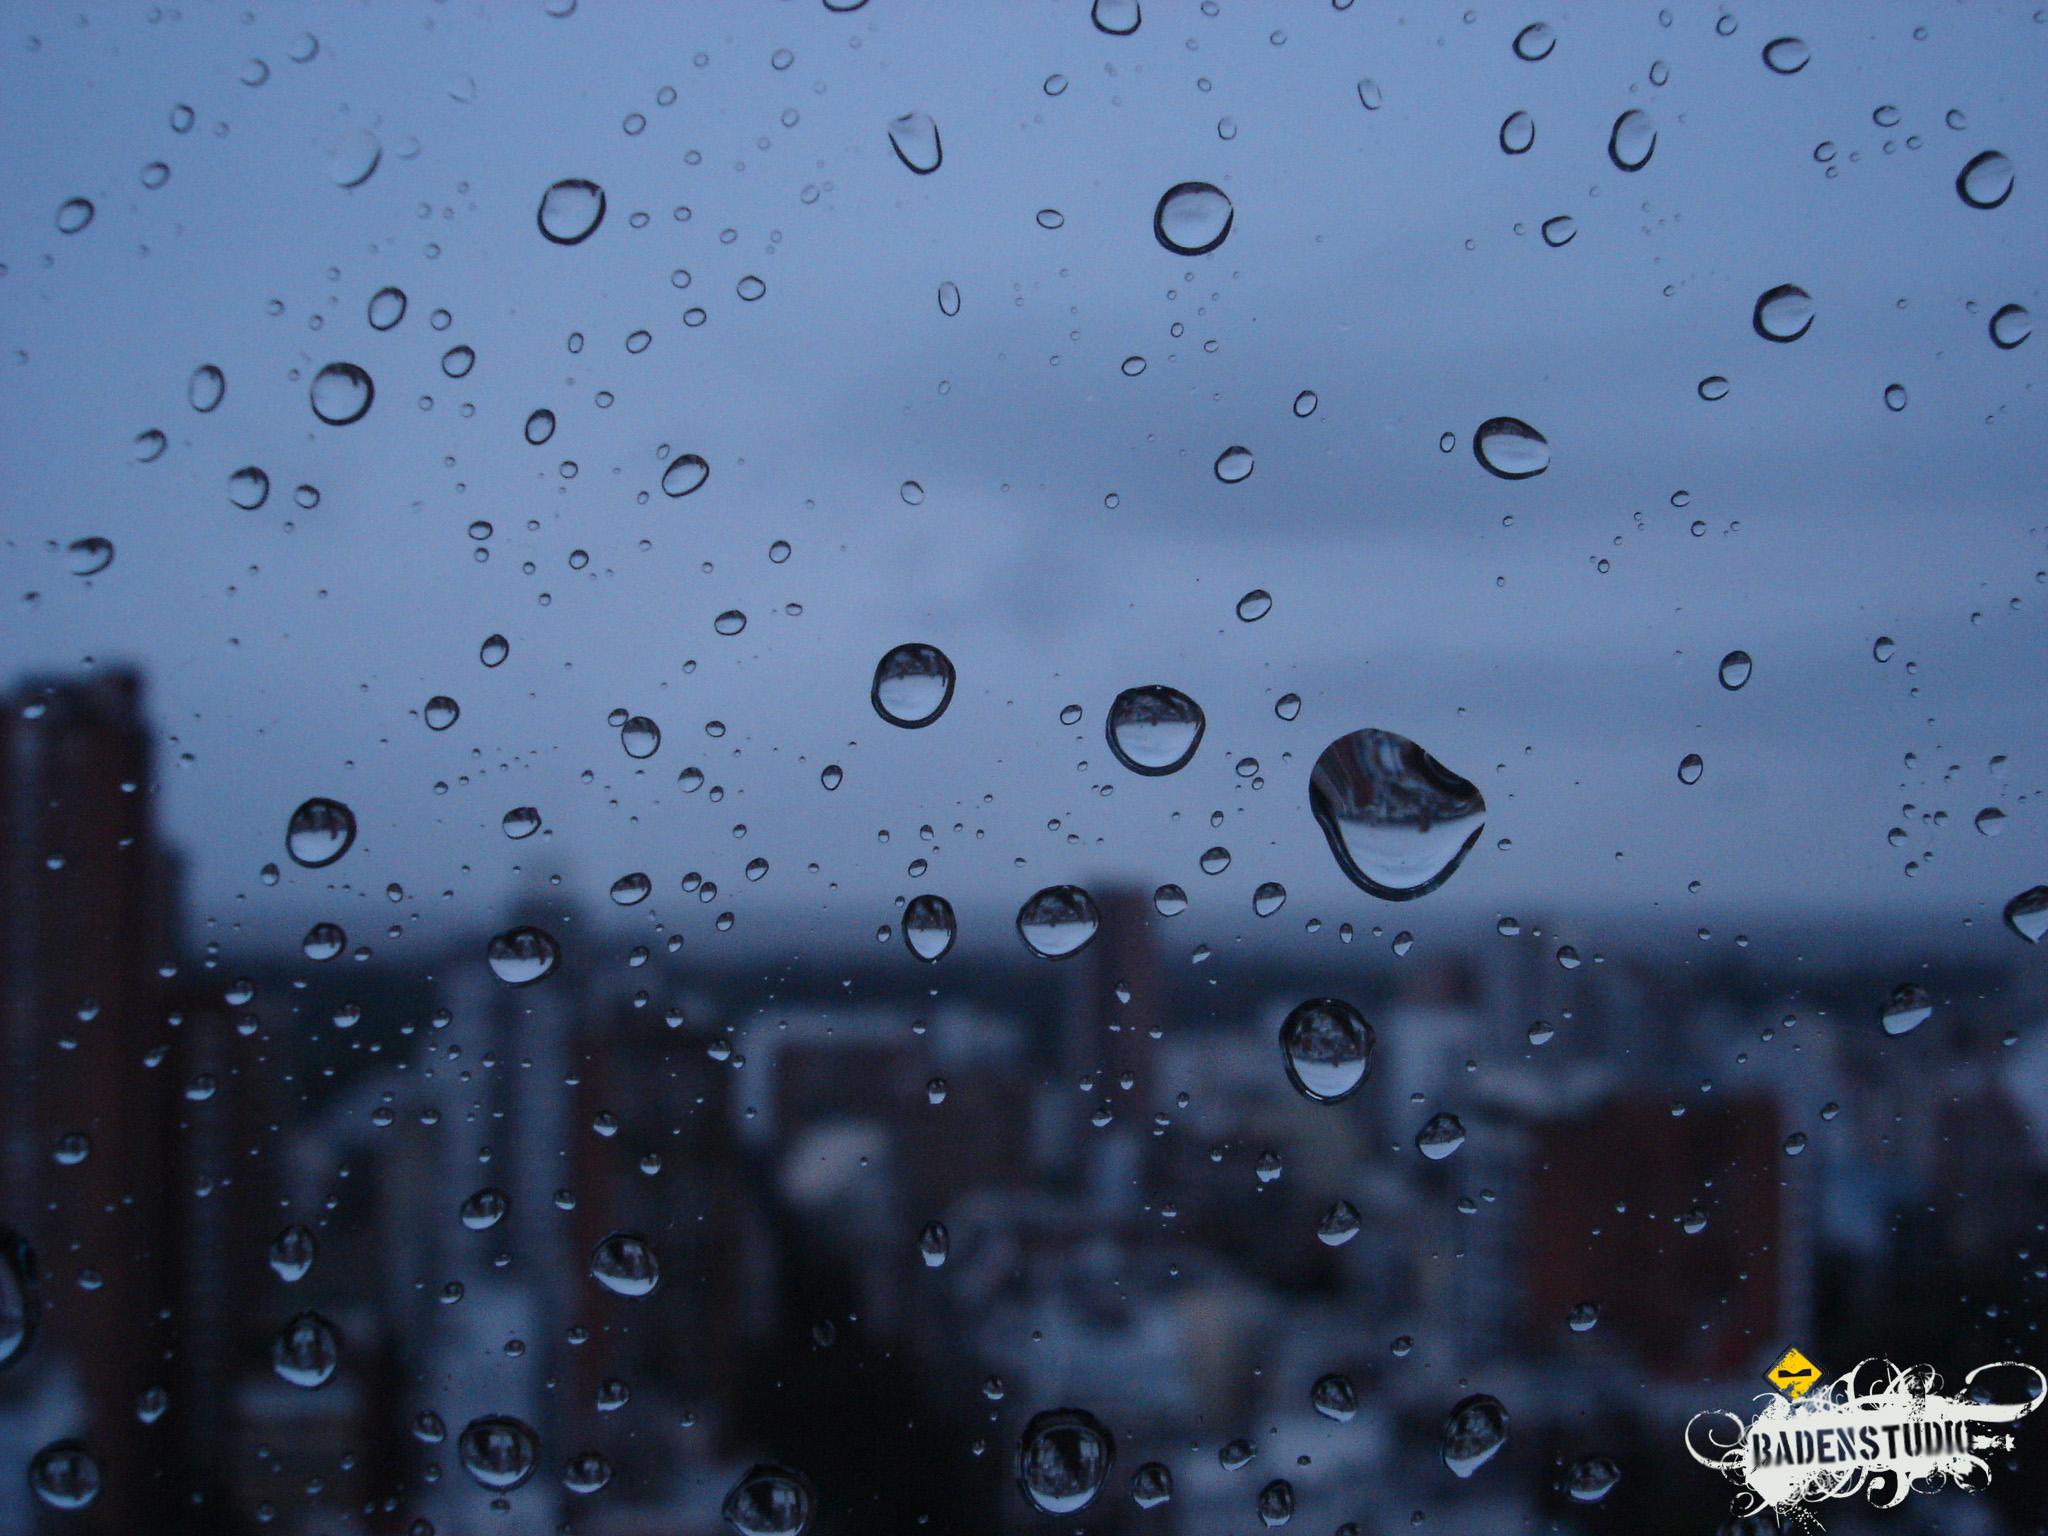 http://fc06.deviantart.net/fs14/f/2006/353/8/d/Its_raining_day_Aleluya____by_badendesing.jpg